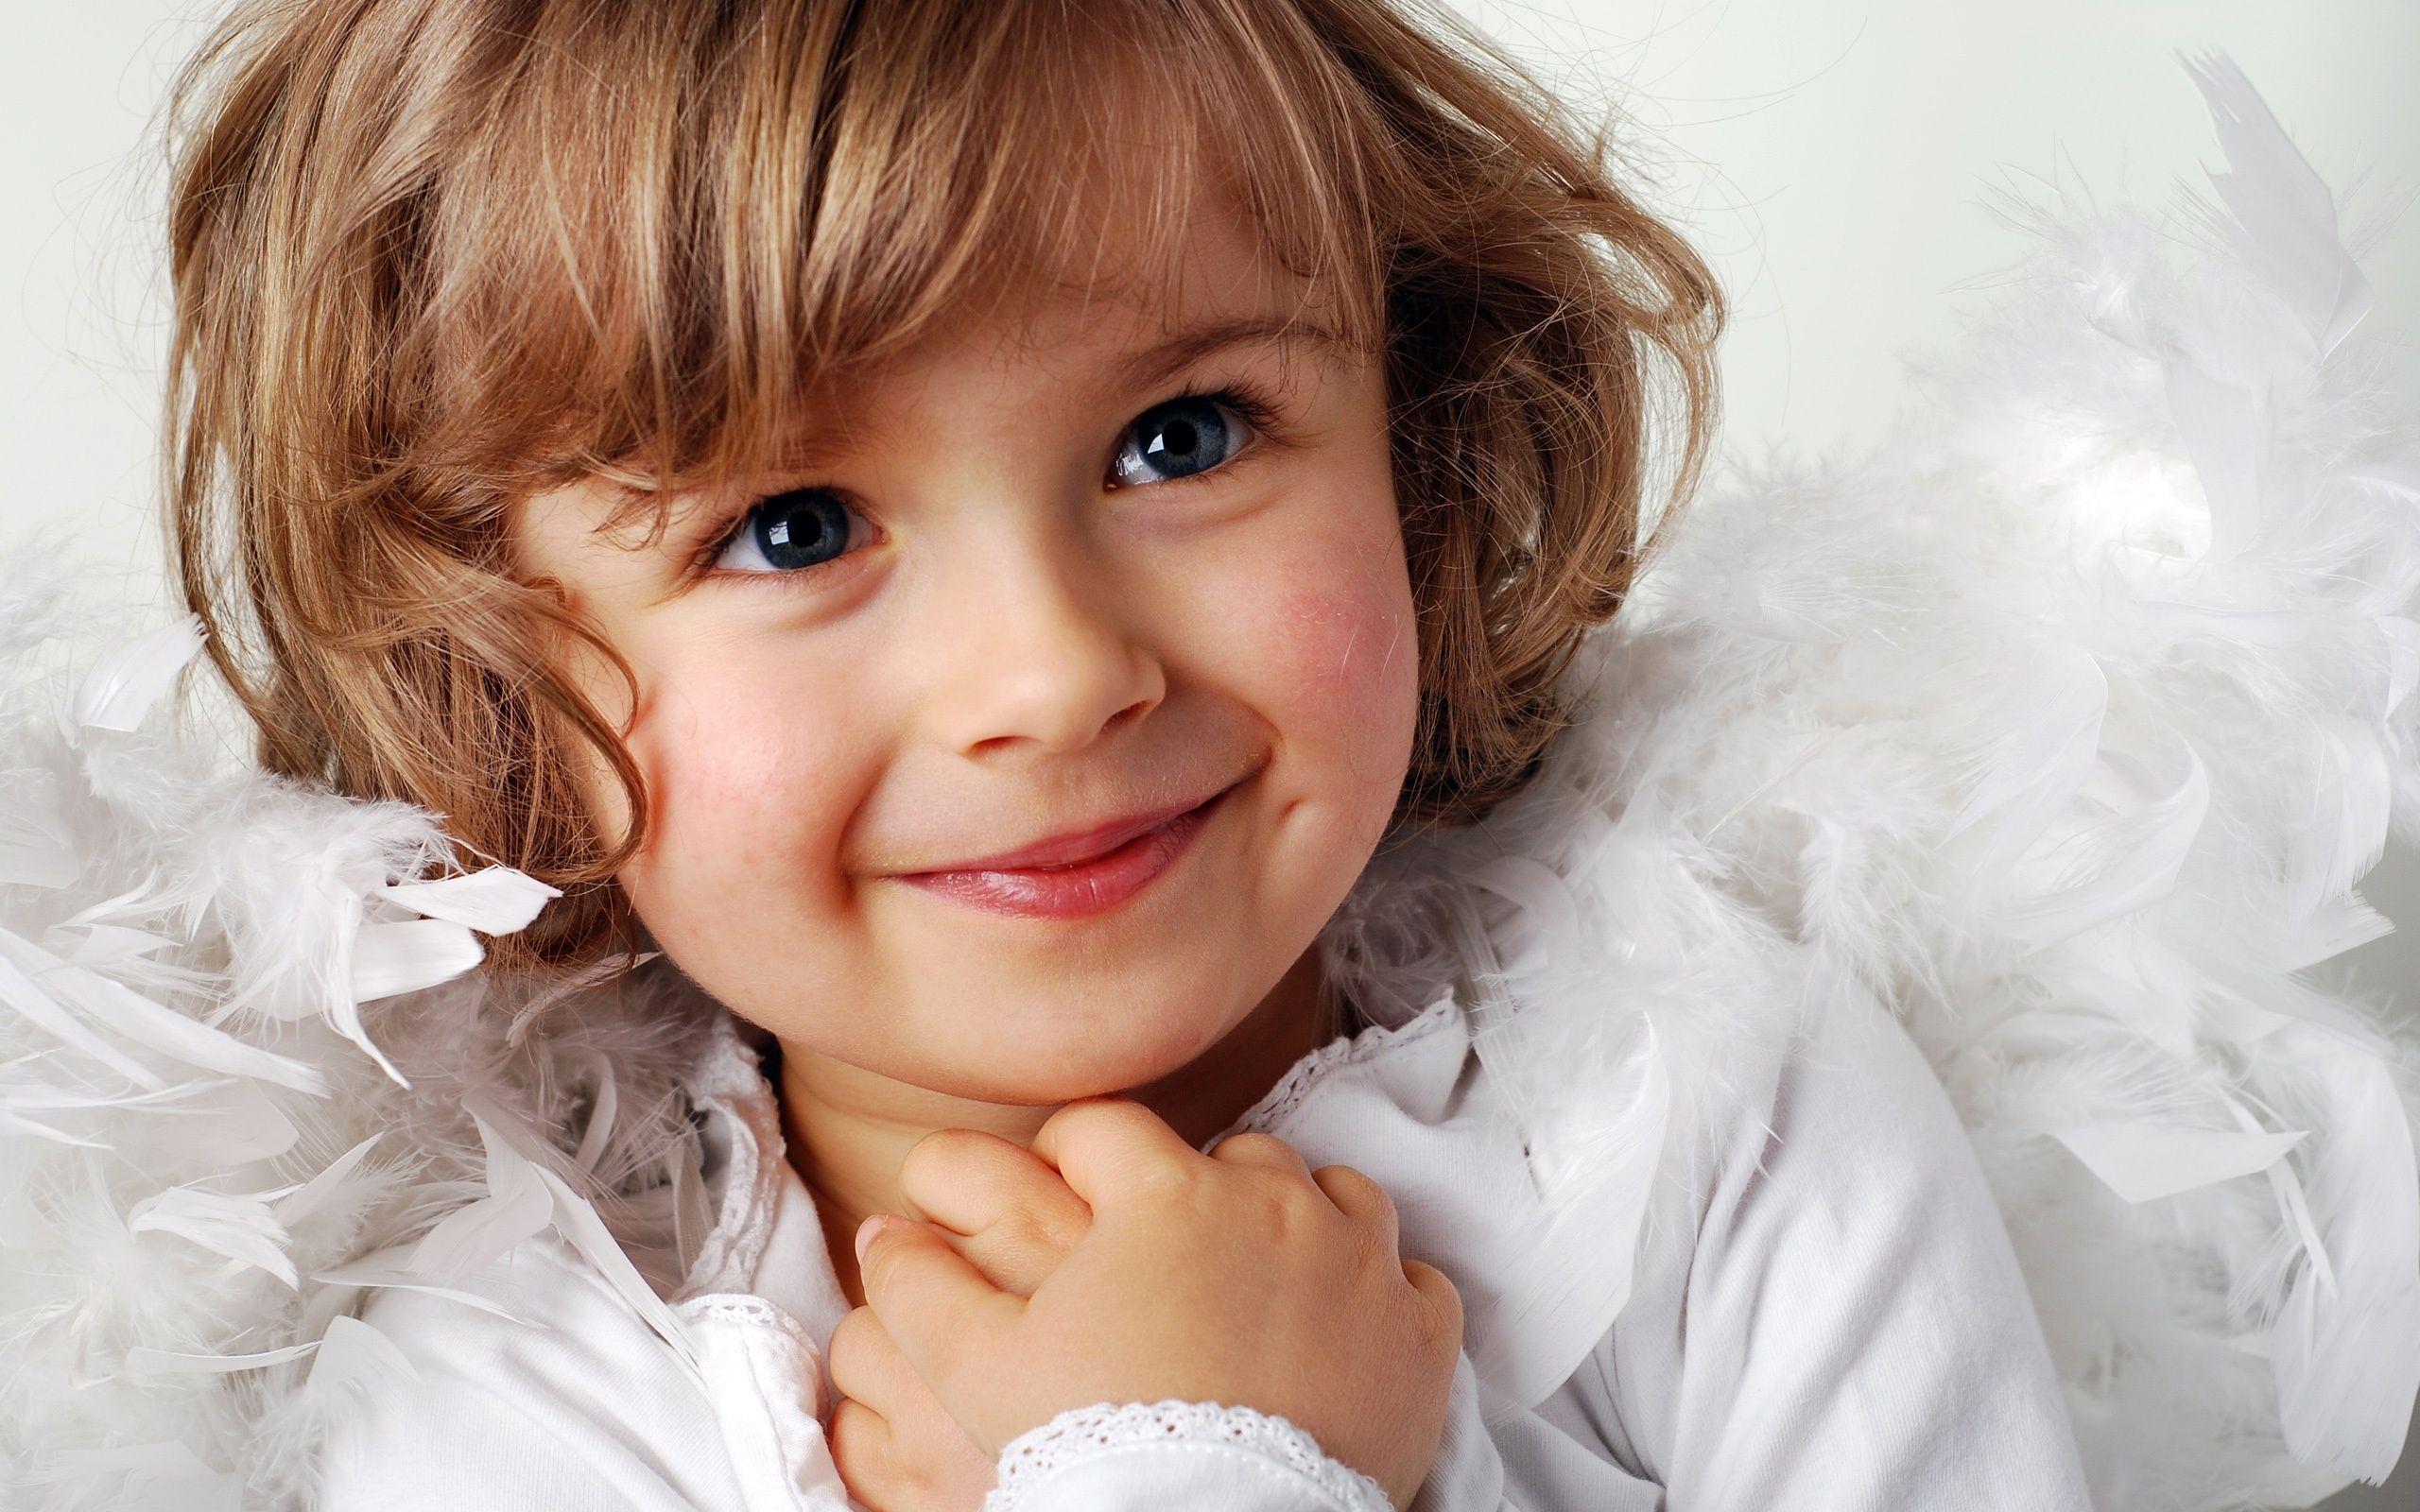 9e49f266bba5 Cute little girl a sweet smile wallpaper - 2560x1600